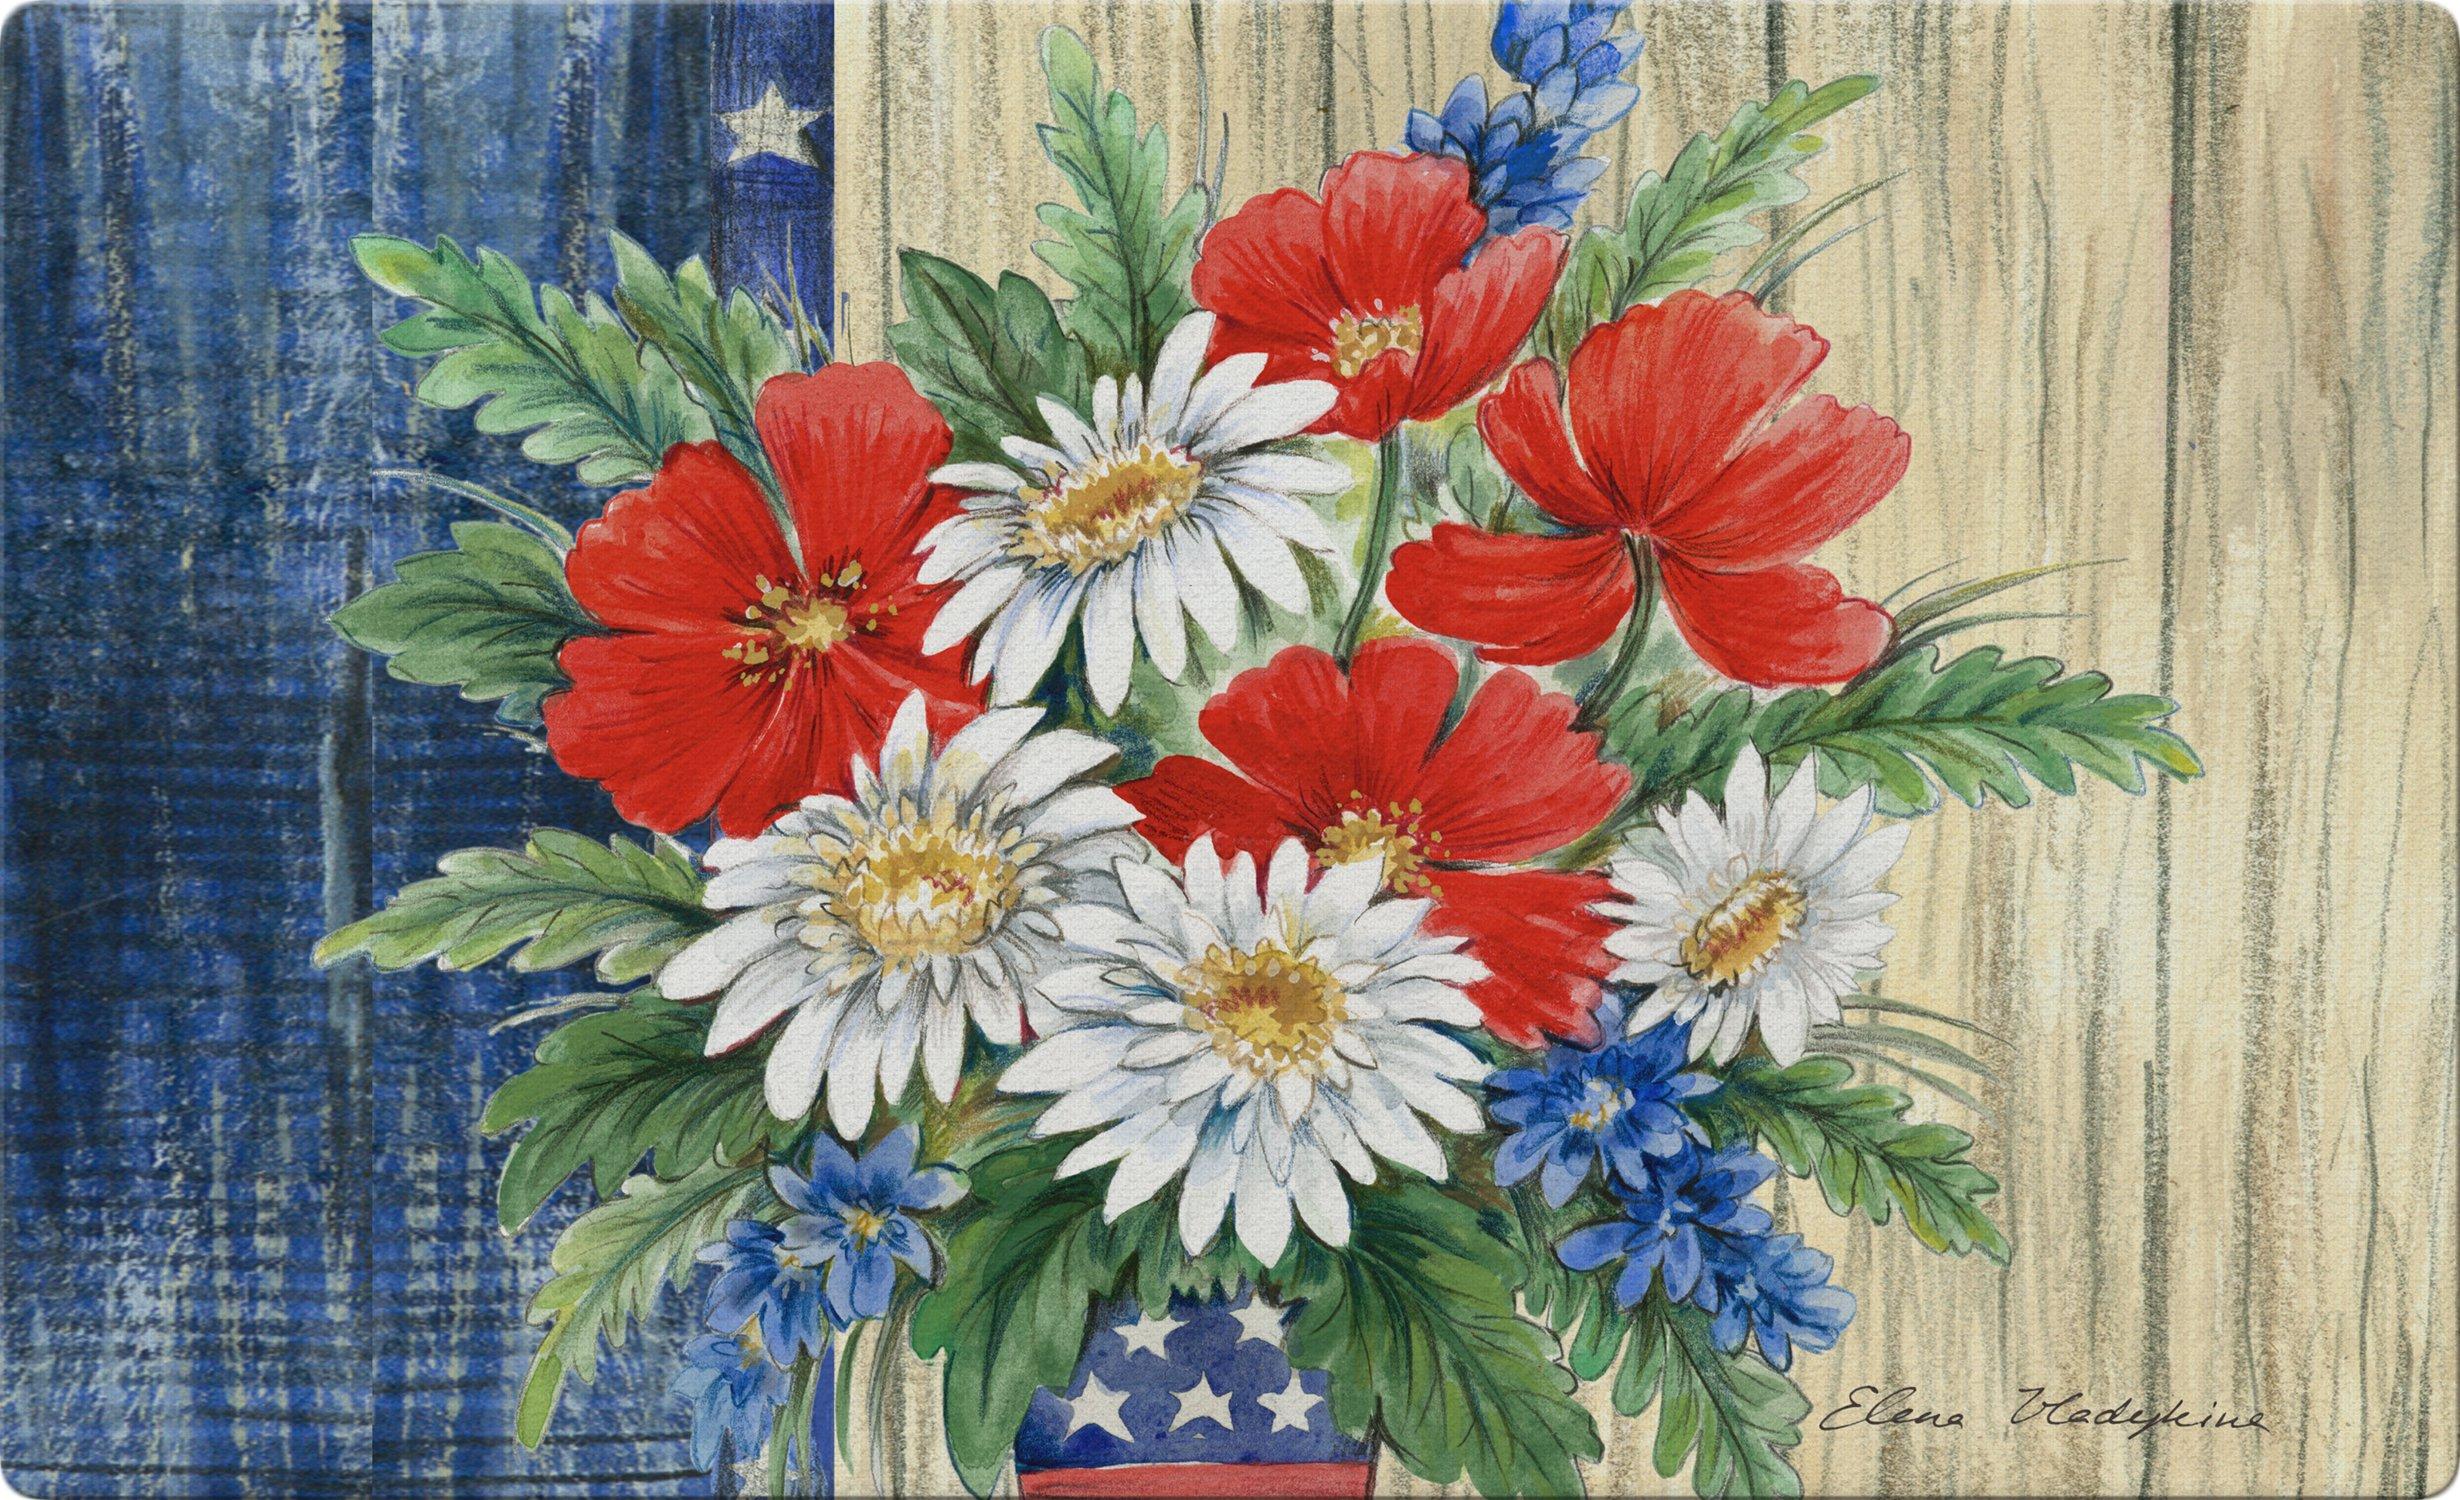 Toland Home Garden Patriotic Bouquet 18 x 30 Inch Decorative Flower Floor Mat USA Floral Doormat